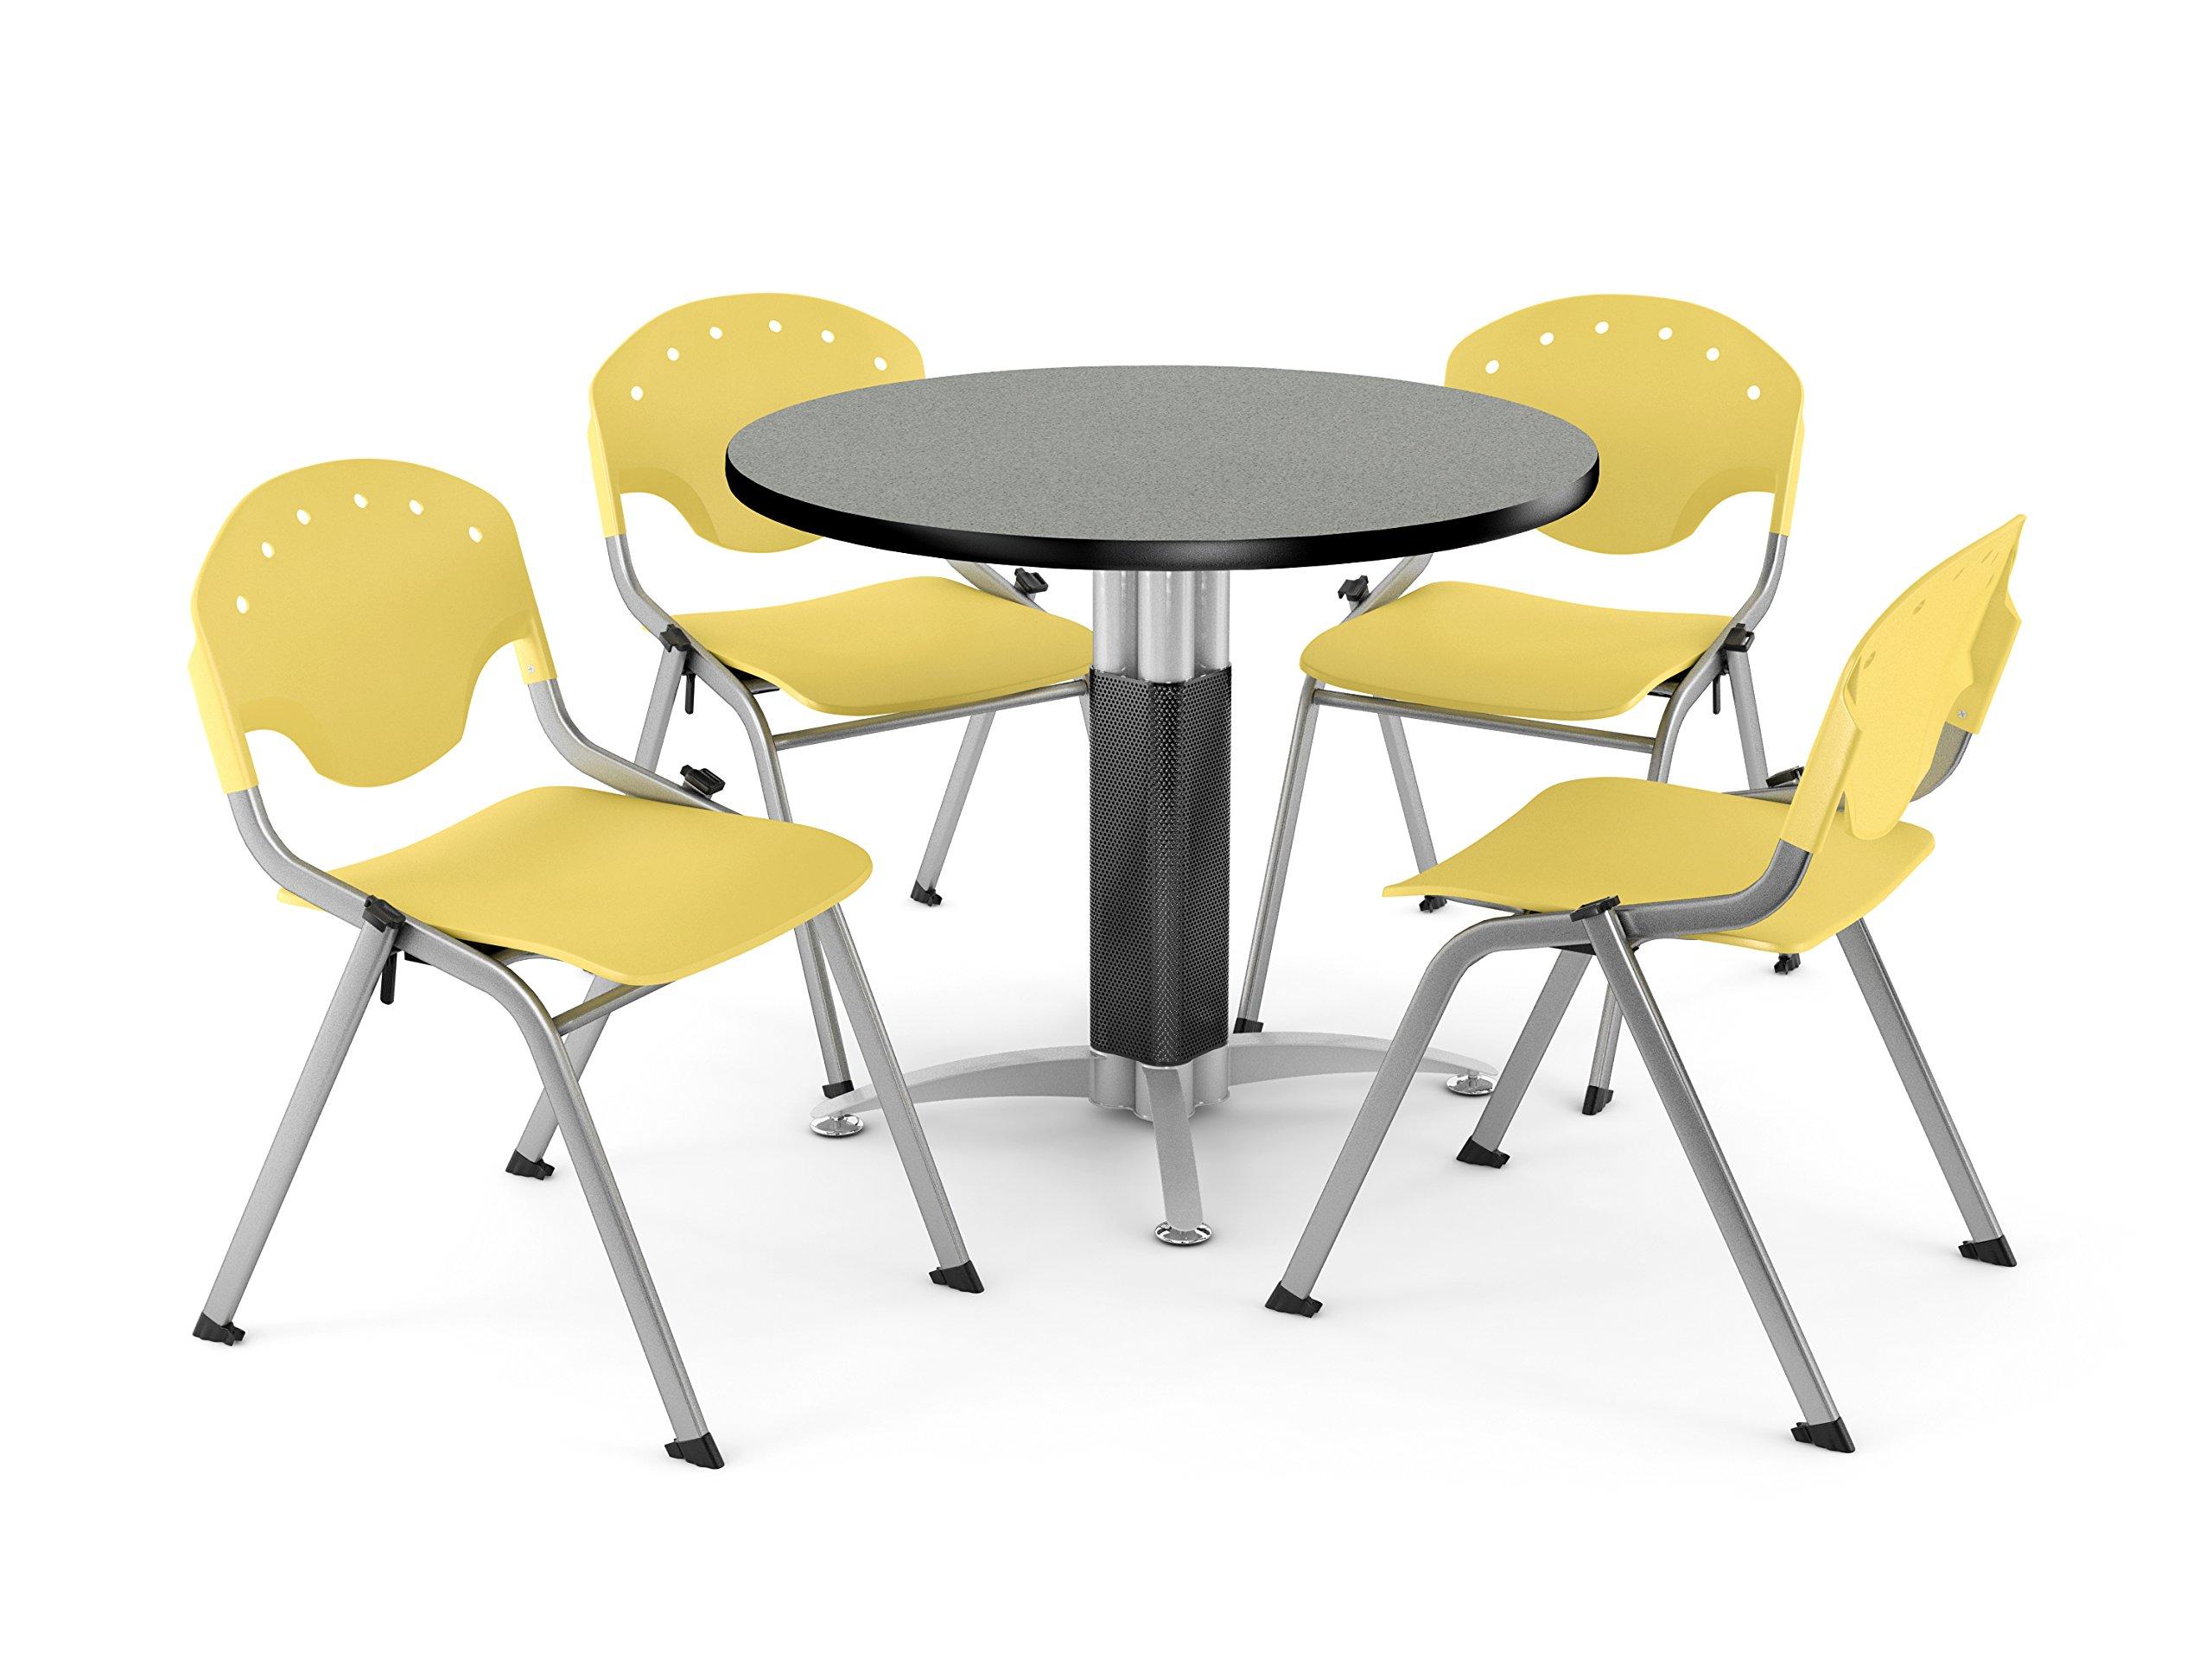 OFM PKG-BRK-021-0010 Breakroom Package, Gray Nebula Table/Lemon Yellow Chair by OFM